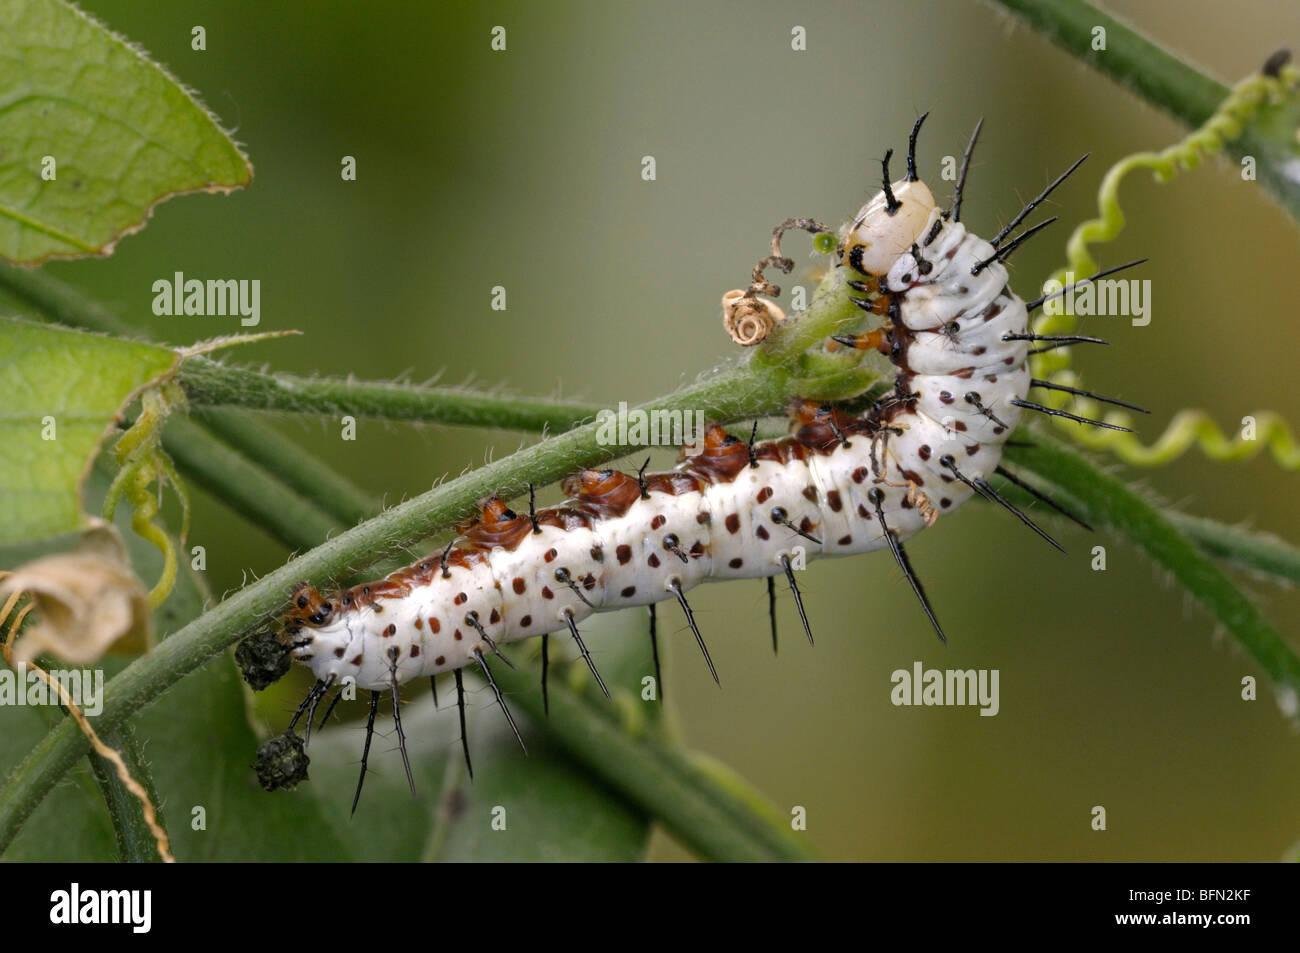 Zebra Longwing, Zebra (Papillon Heliconius charithonia). Caterpillar se nourrissent d'une Passiflora feuille. Photo Stock